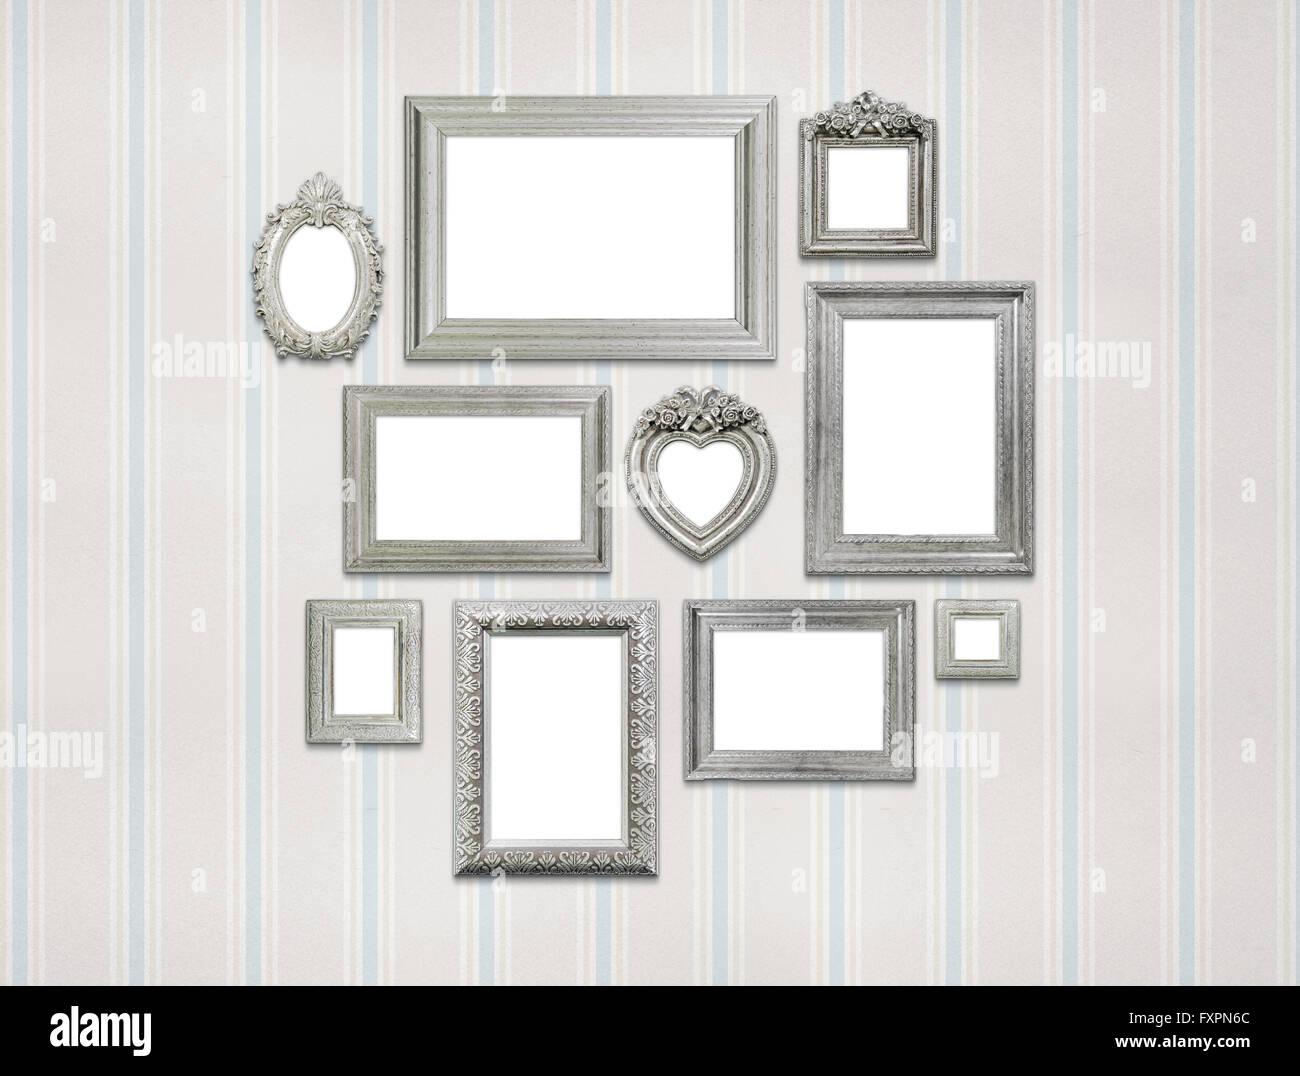 Leere Bilderrahmen auf grüne Wand Stockfoto, Bild: 102532484 - Alamy